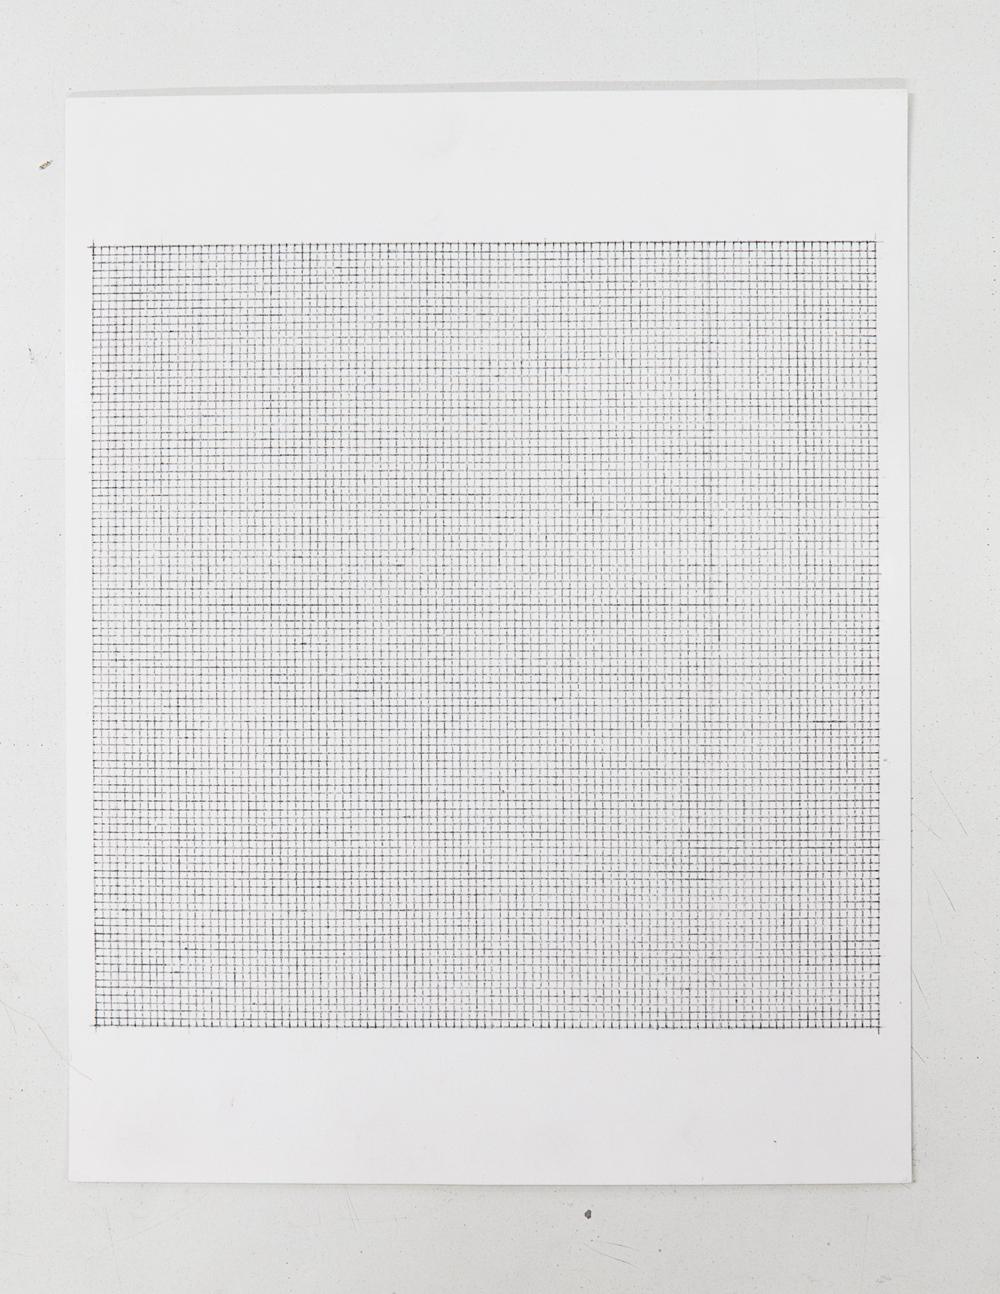 (PRISONTIME/PRISONINME: Transition to Metric) 2mm x 2mm on 20cm x 20cm,  2014   Pencil on semi-matte inkjet fiber paper, 8.5 in.x 11 in.